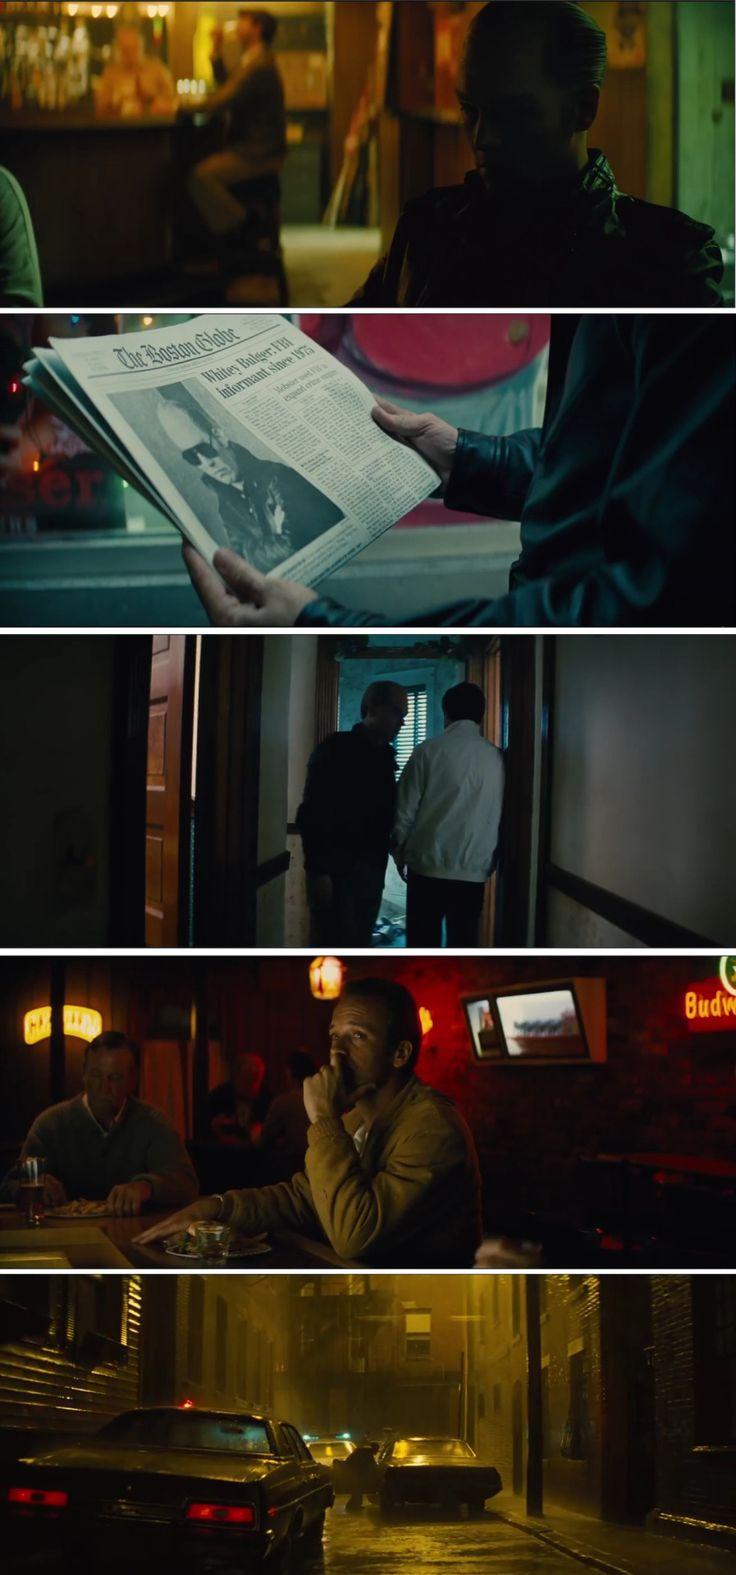 Black Mass (2015) - Cinematography by Masanobu Takayanagi | Directed by Scott Cooper